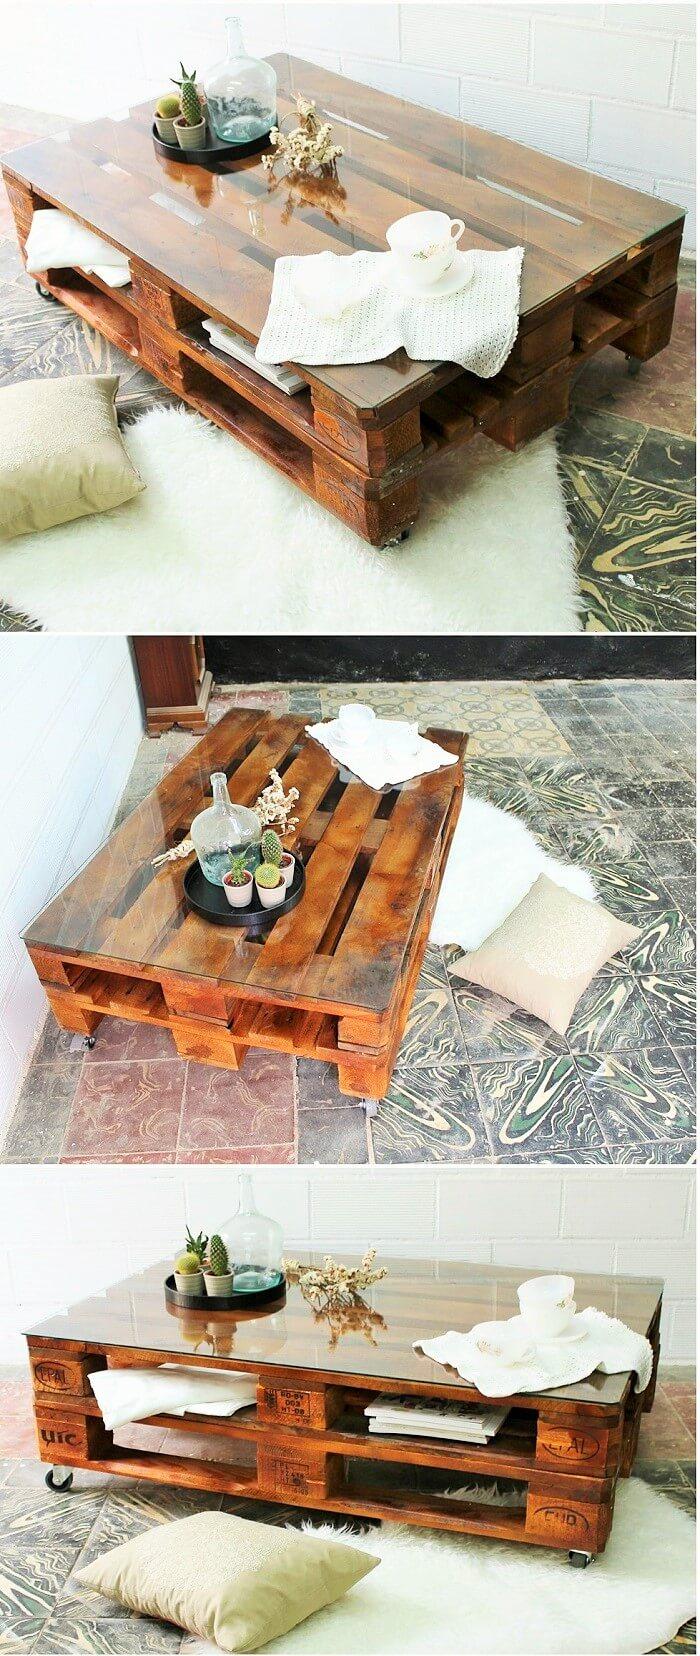 Wooden pallets cofi table ideas (2)